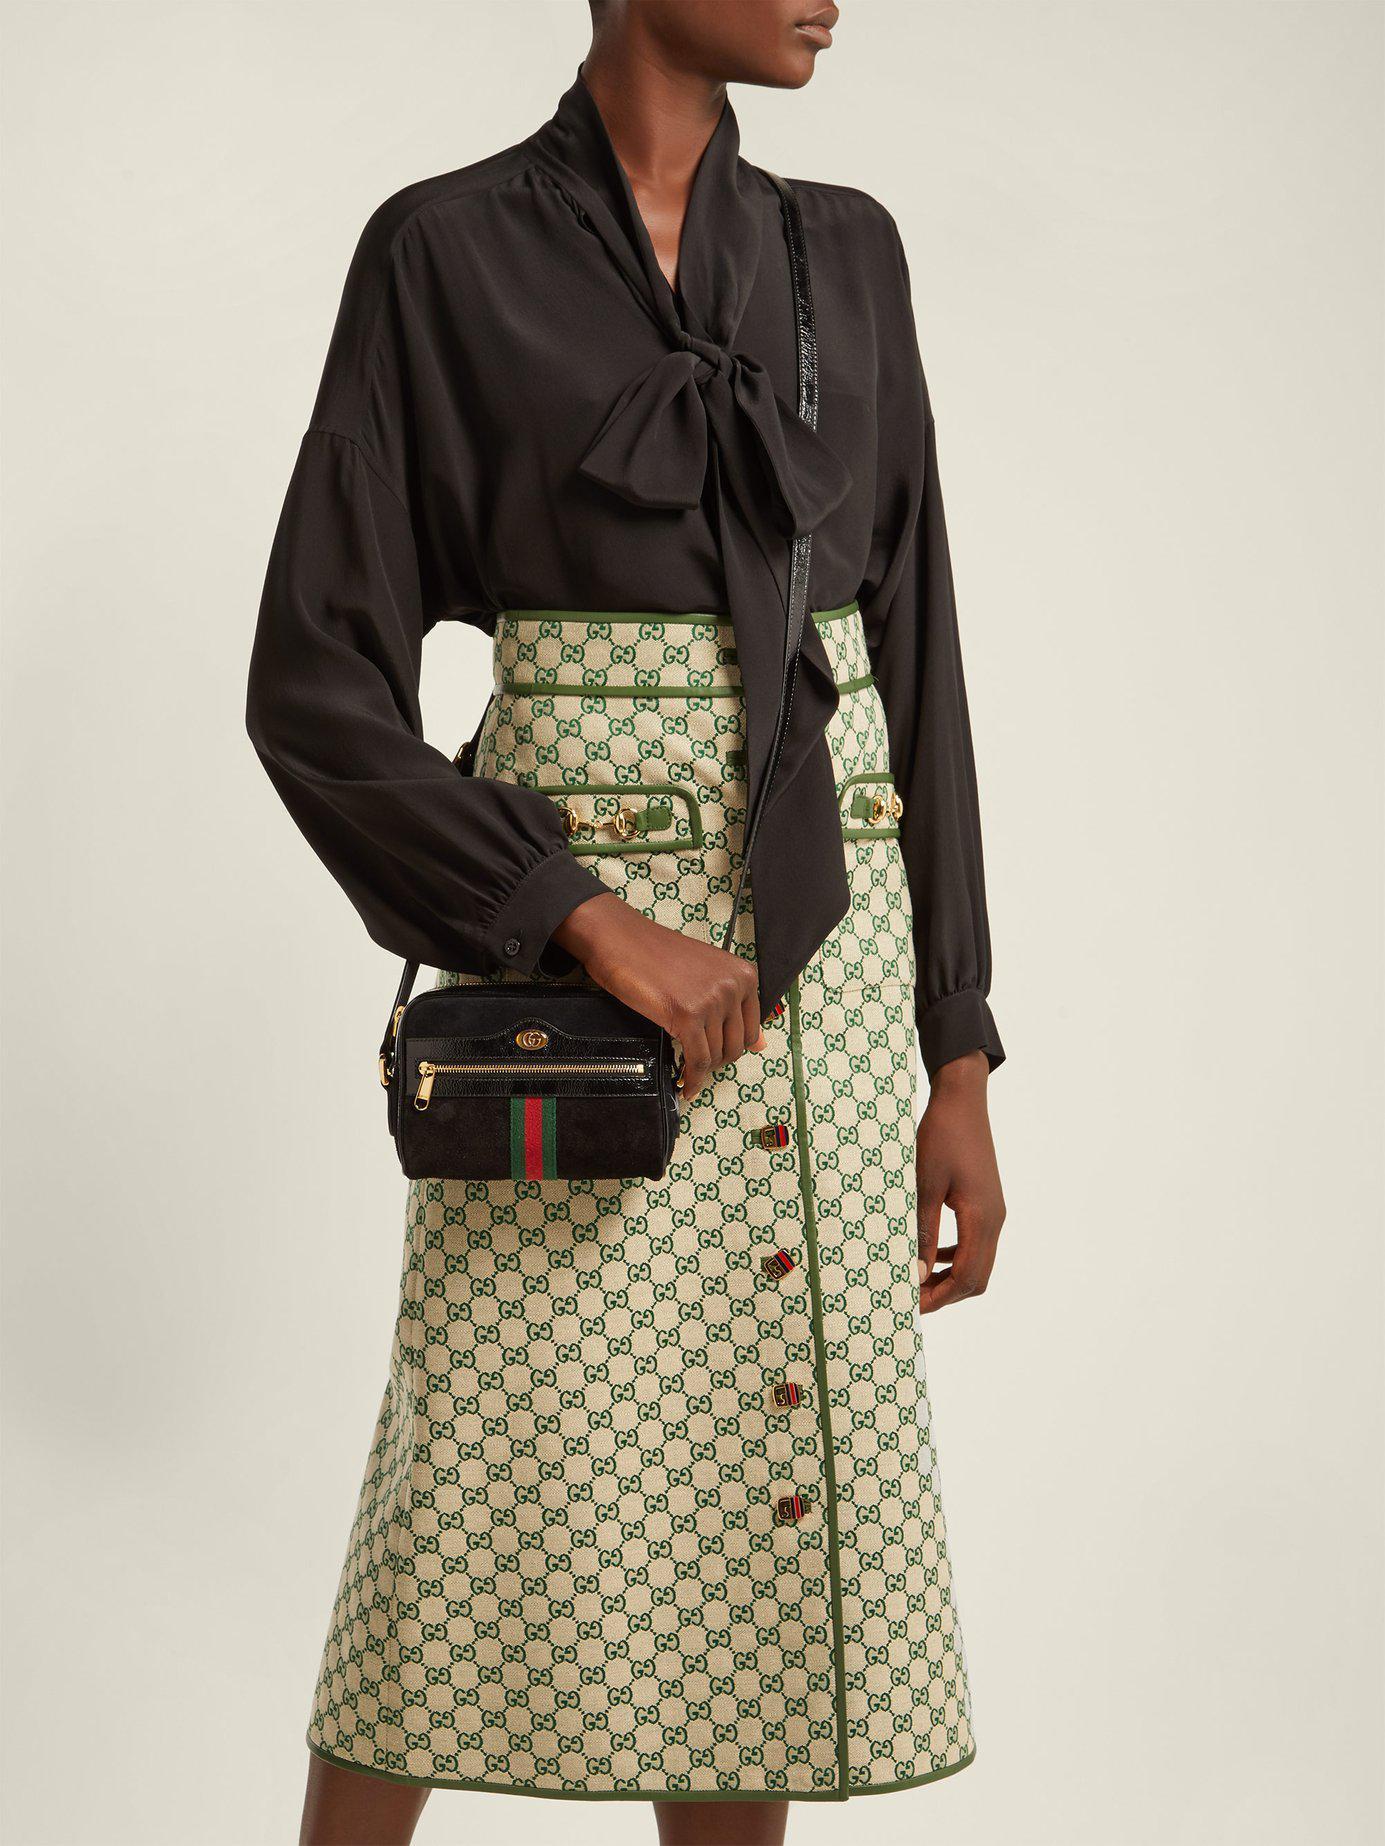 6f3bdd25cd29 Gucci Ophidia Black Suede Cross Body Mini Bag in Black - Lyst